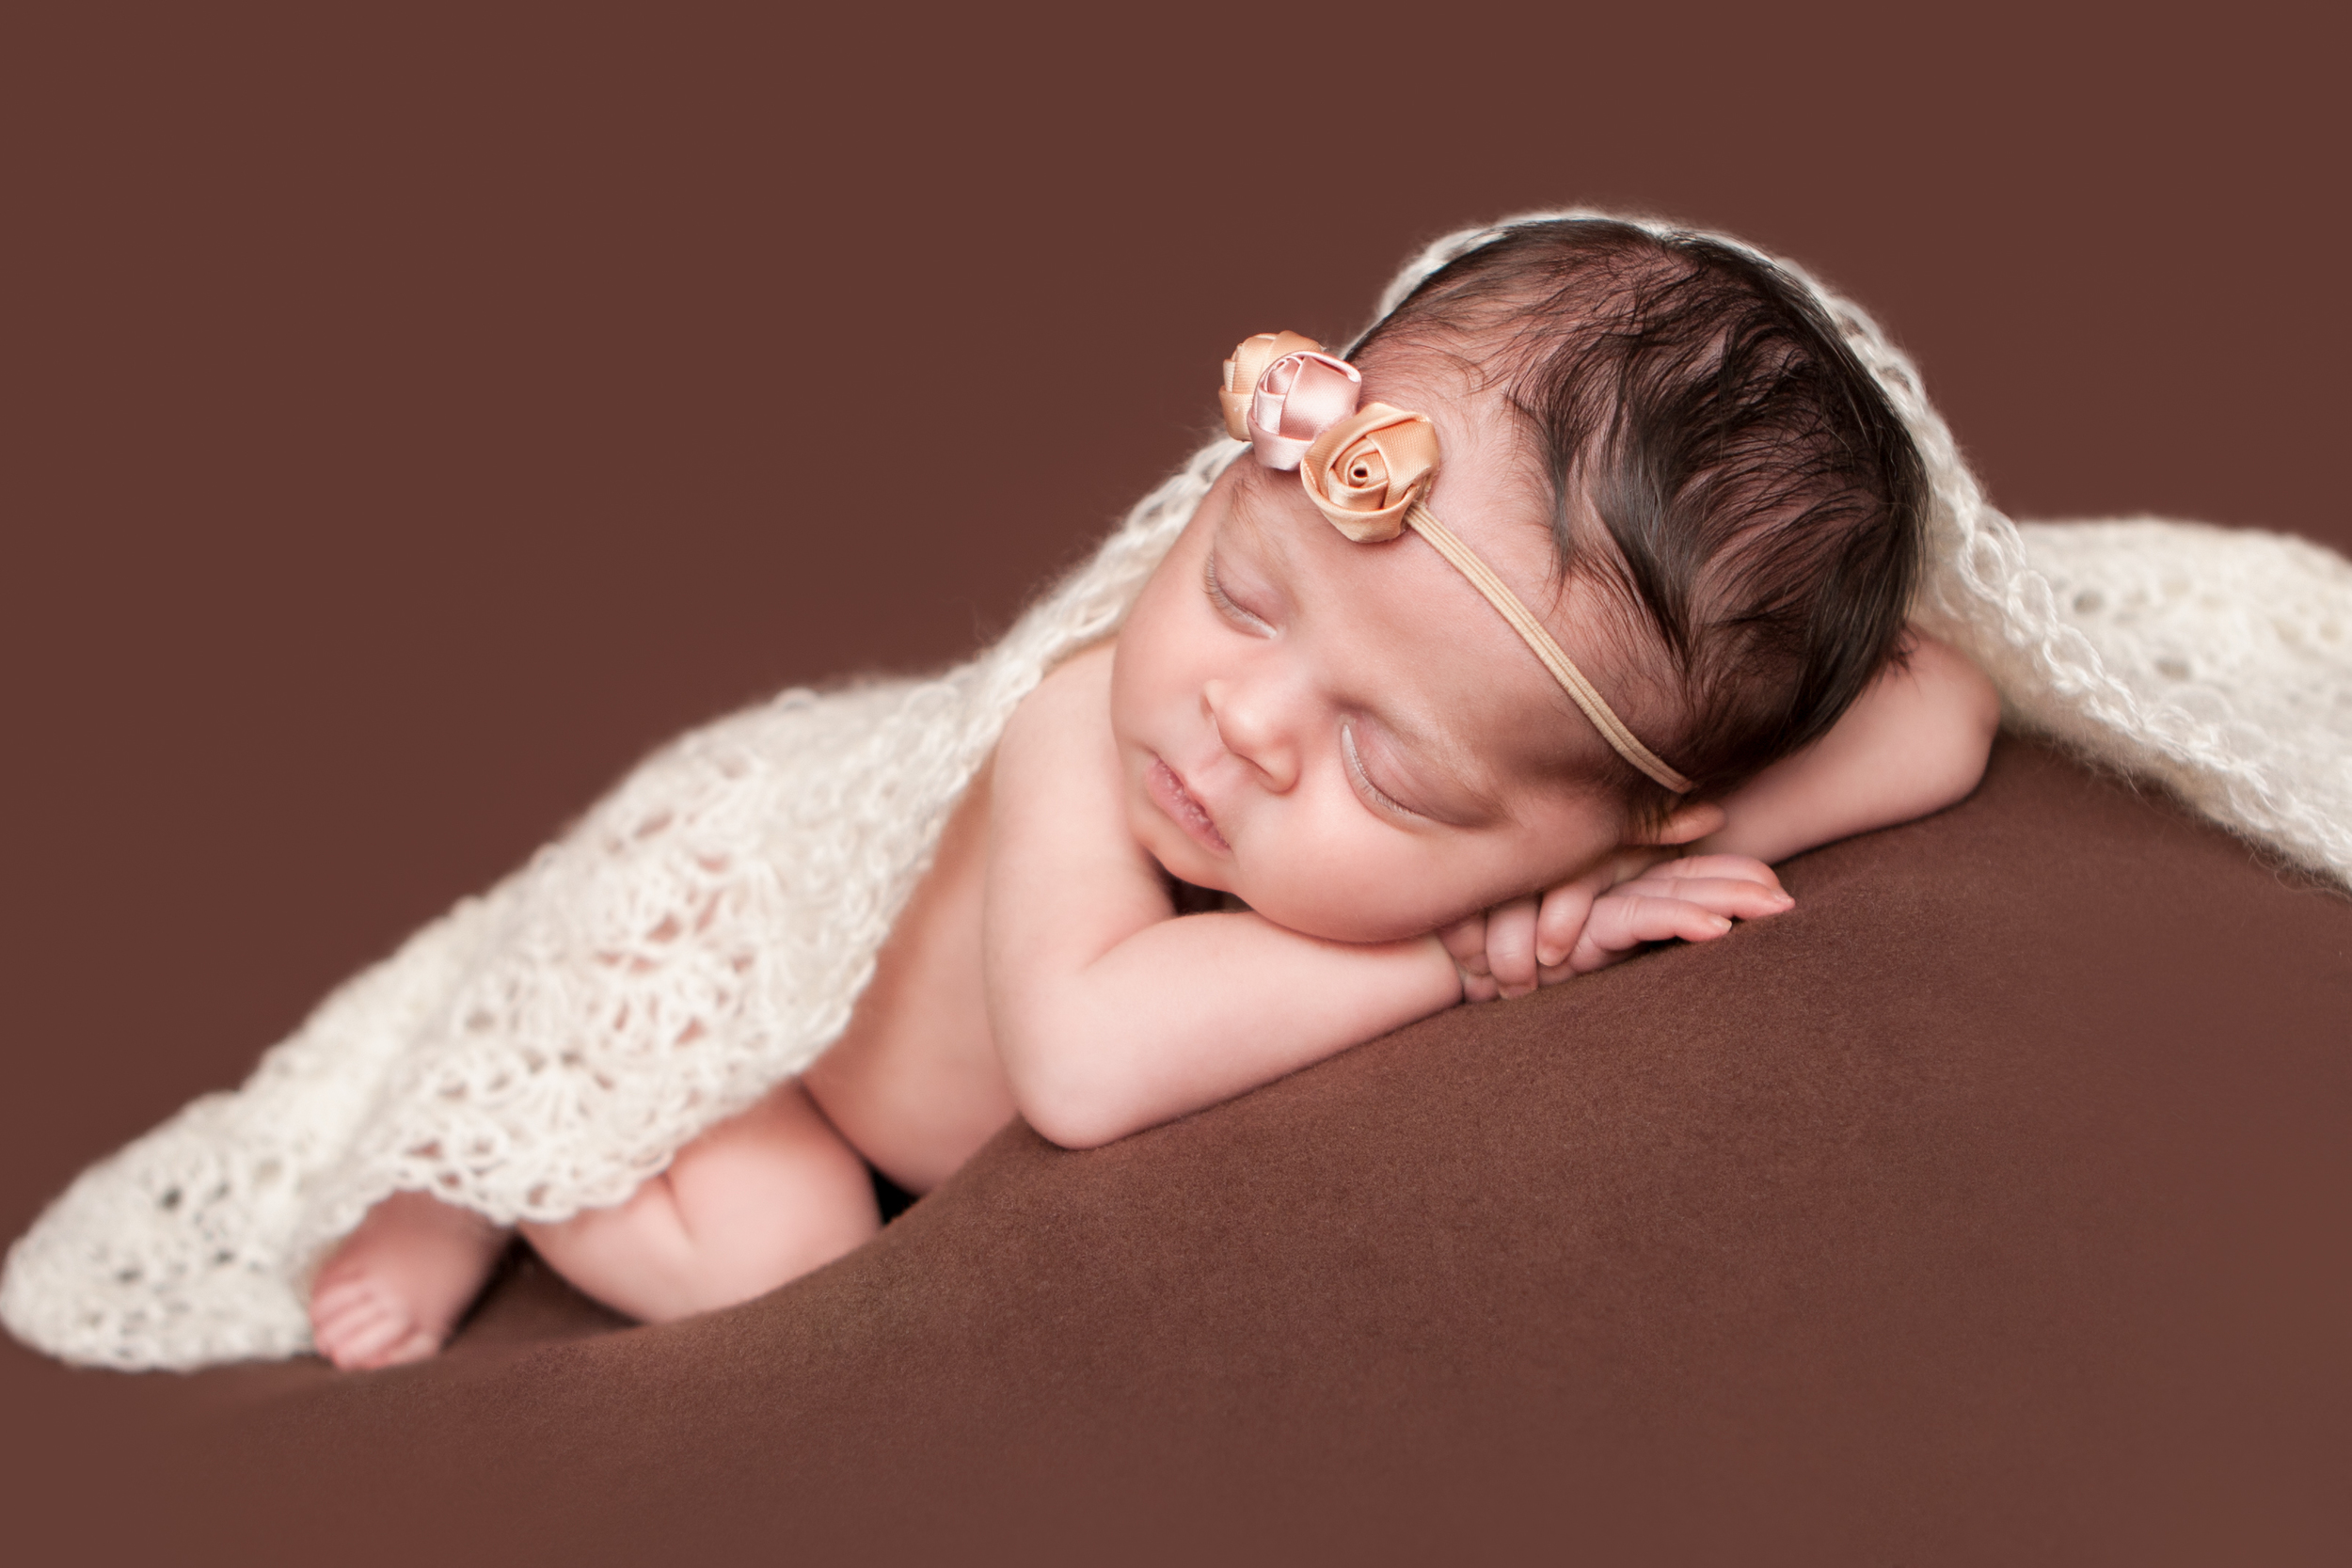 Newborn baby girl, shabby rosebud flower headband orange pink nude, brown backdrop fabric blanket, white creme crochet wrap, head on hands pose, sleeping baby pose on beanbag, Westchester County, New Rochelle, White Plains, Pelham, New York Newborn Photographer, Amanda Noelle Photography